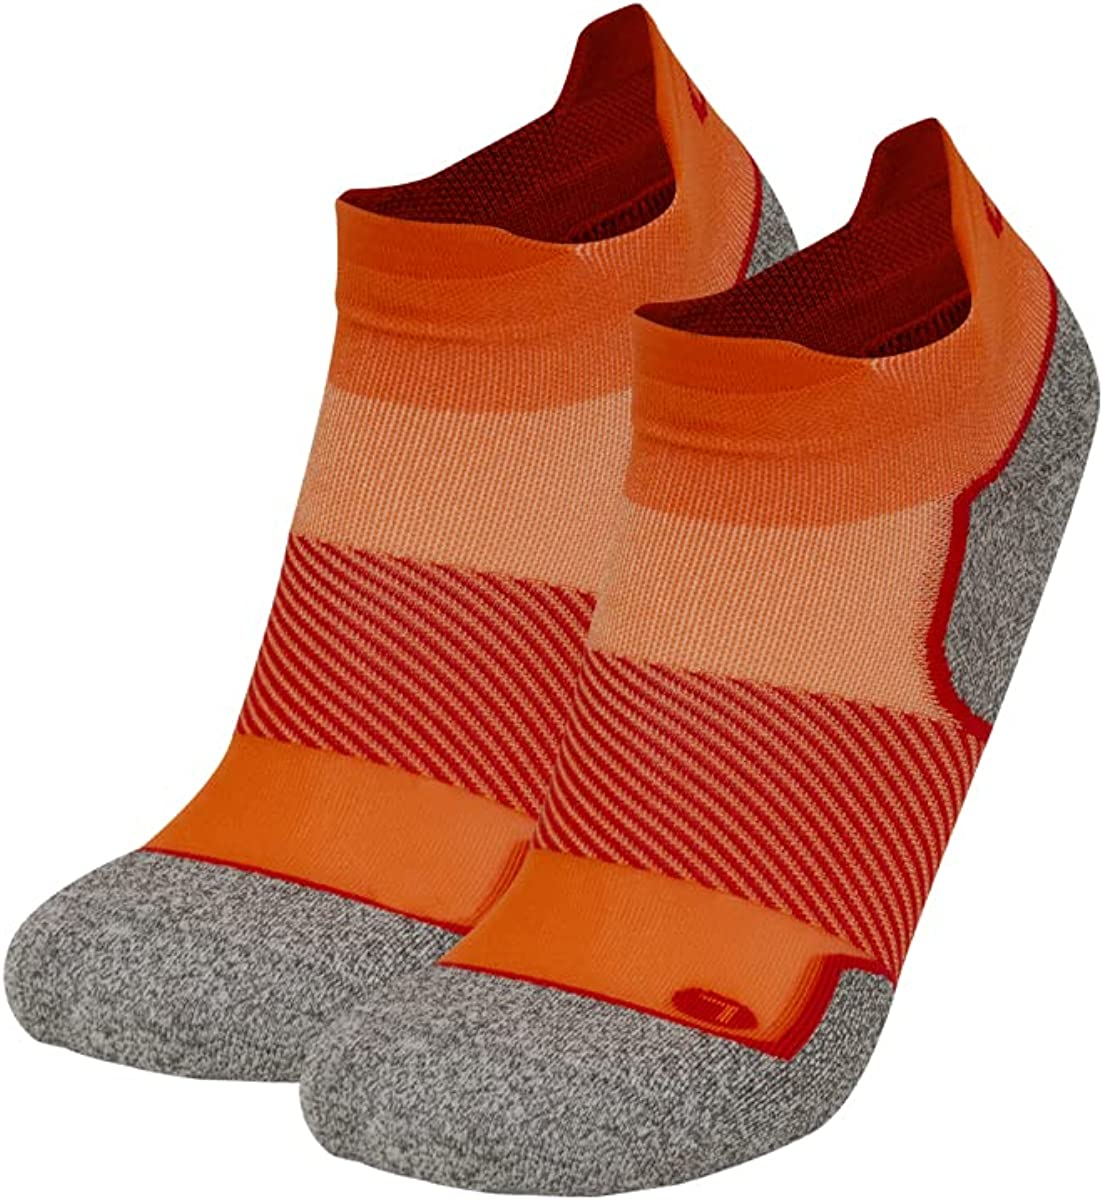 OS1st AC4 Blister Protection Noshow Active Comfort Socks light-mod compression